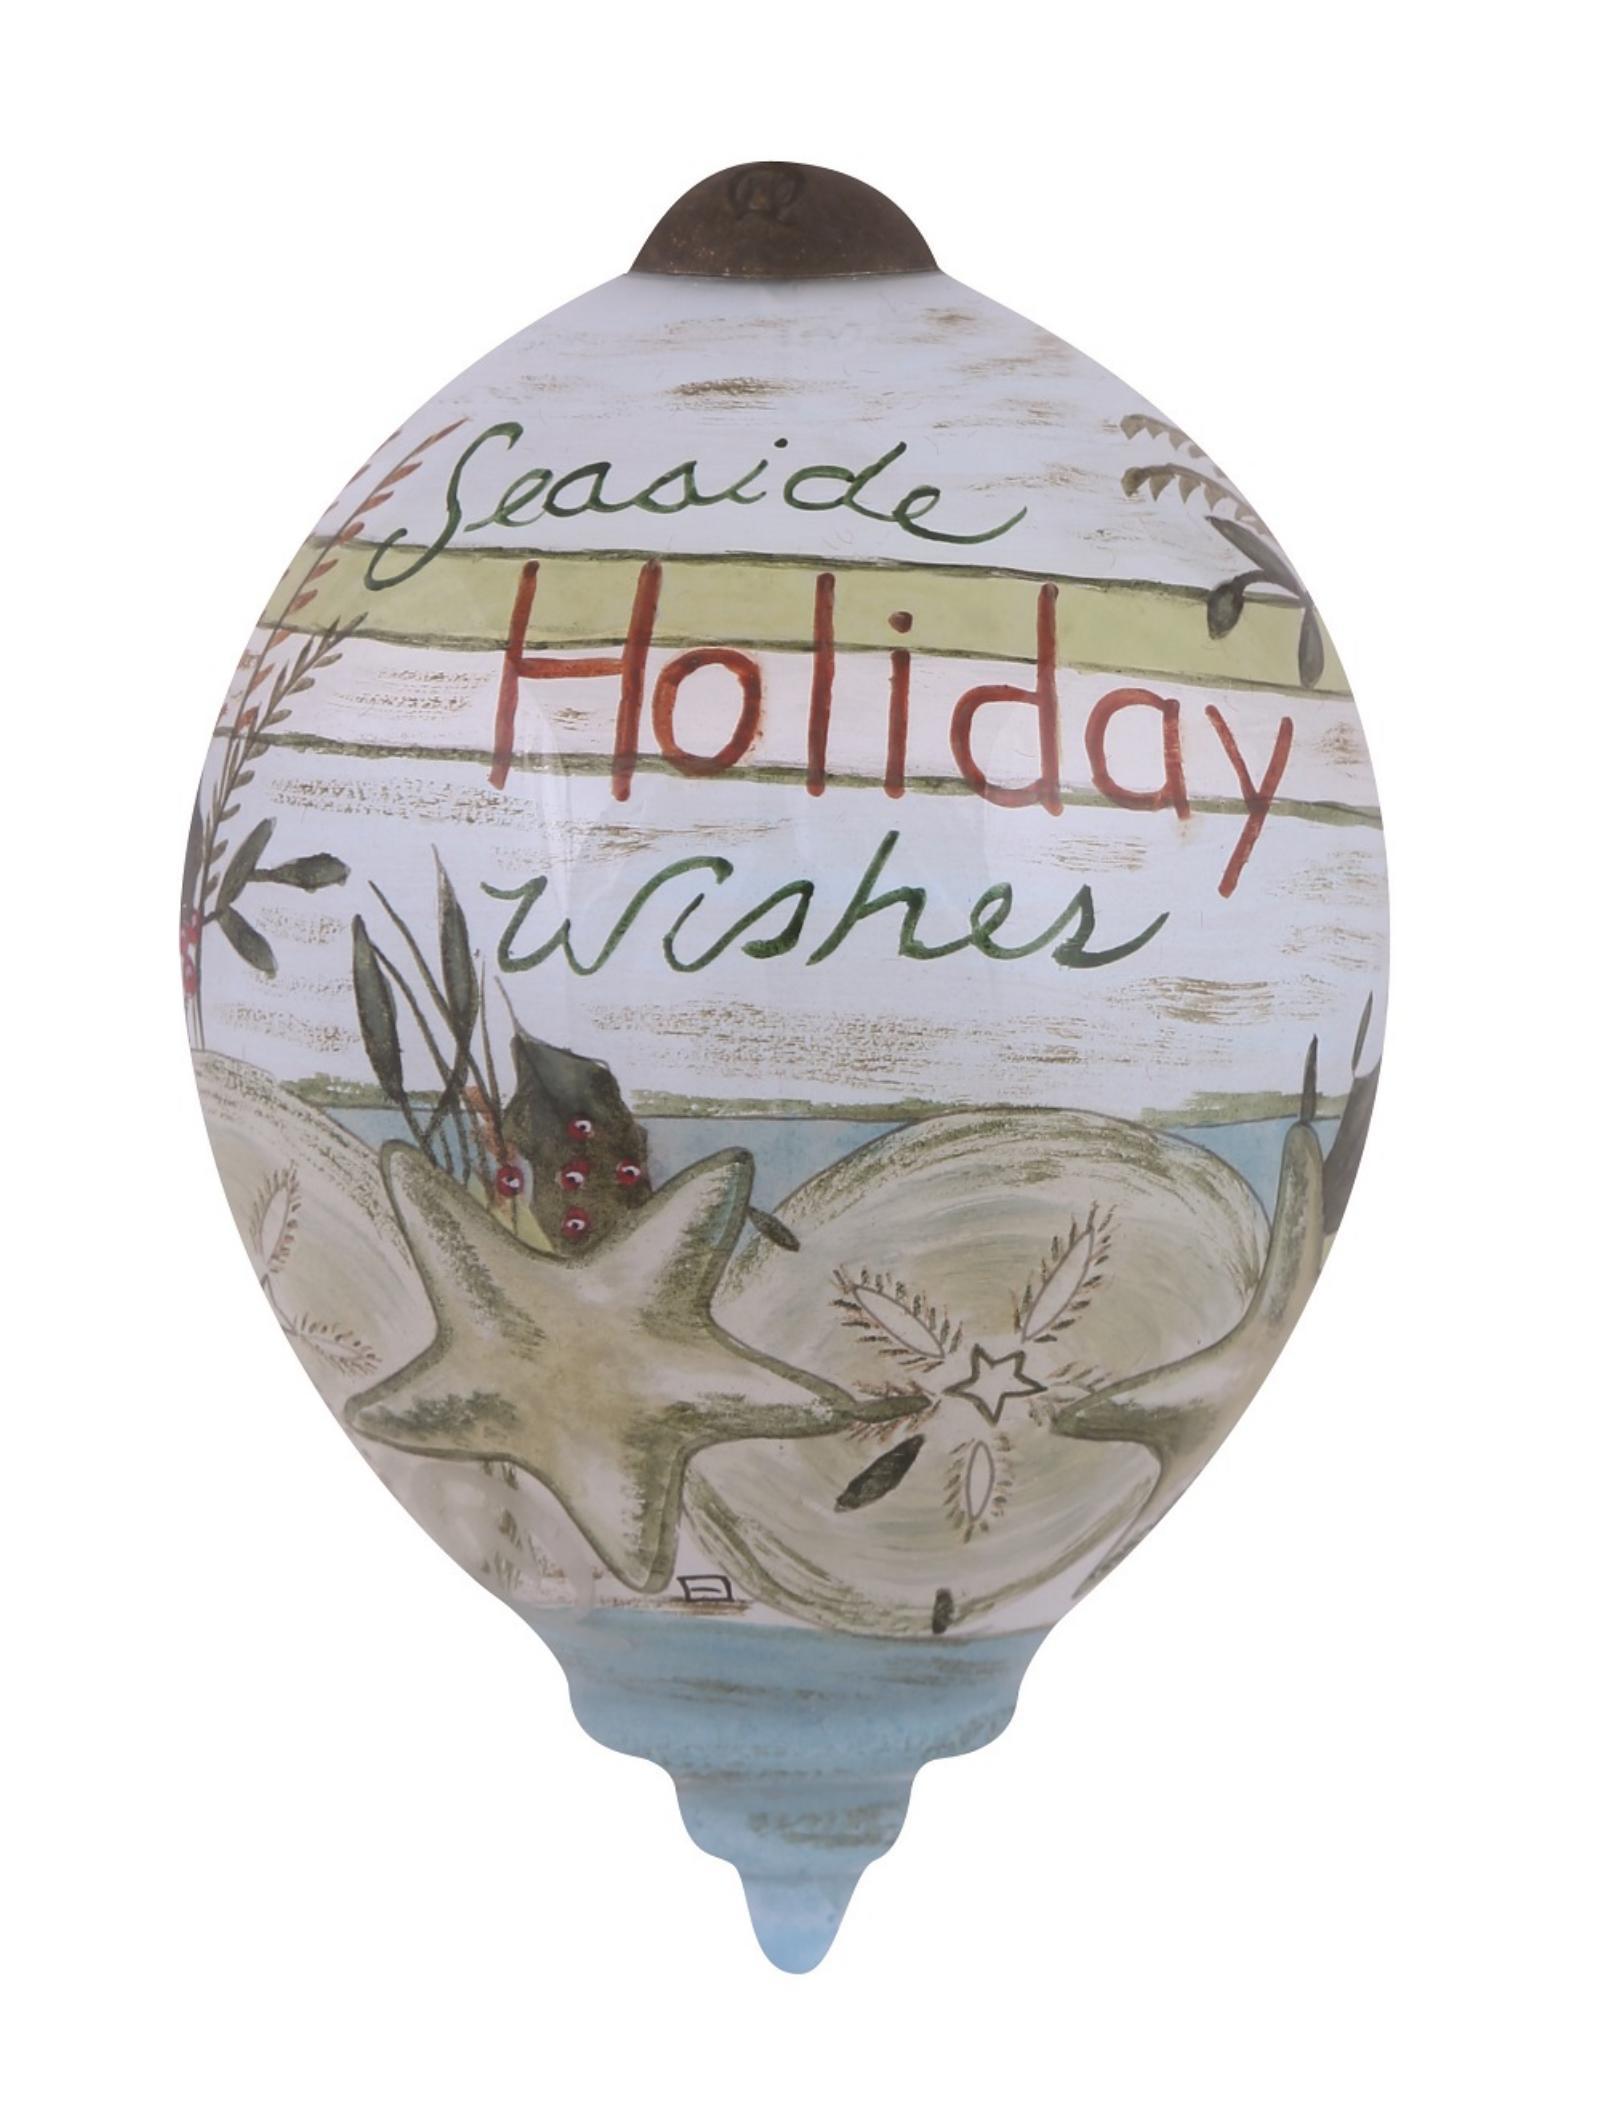 Seaside Holiday Wishes